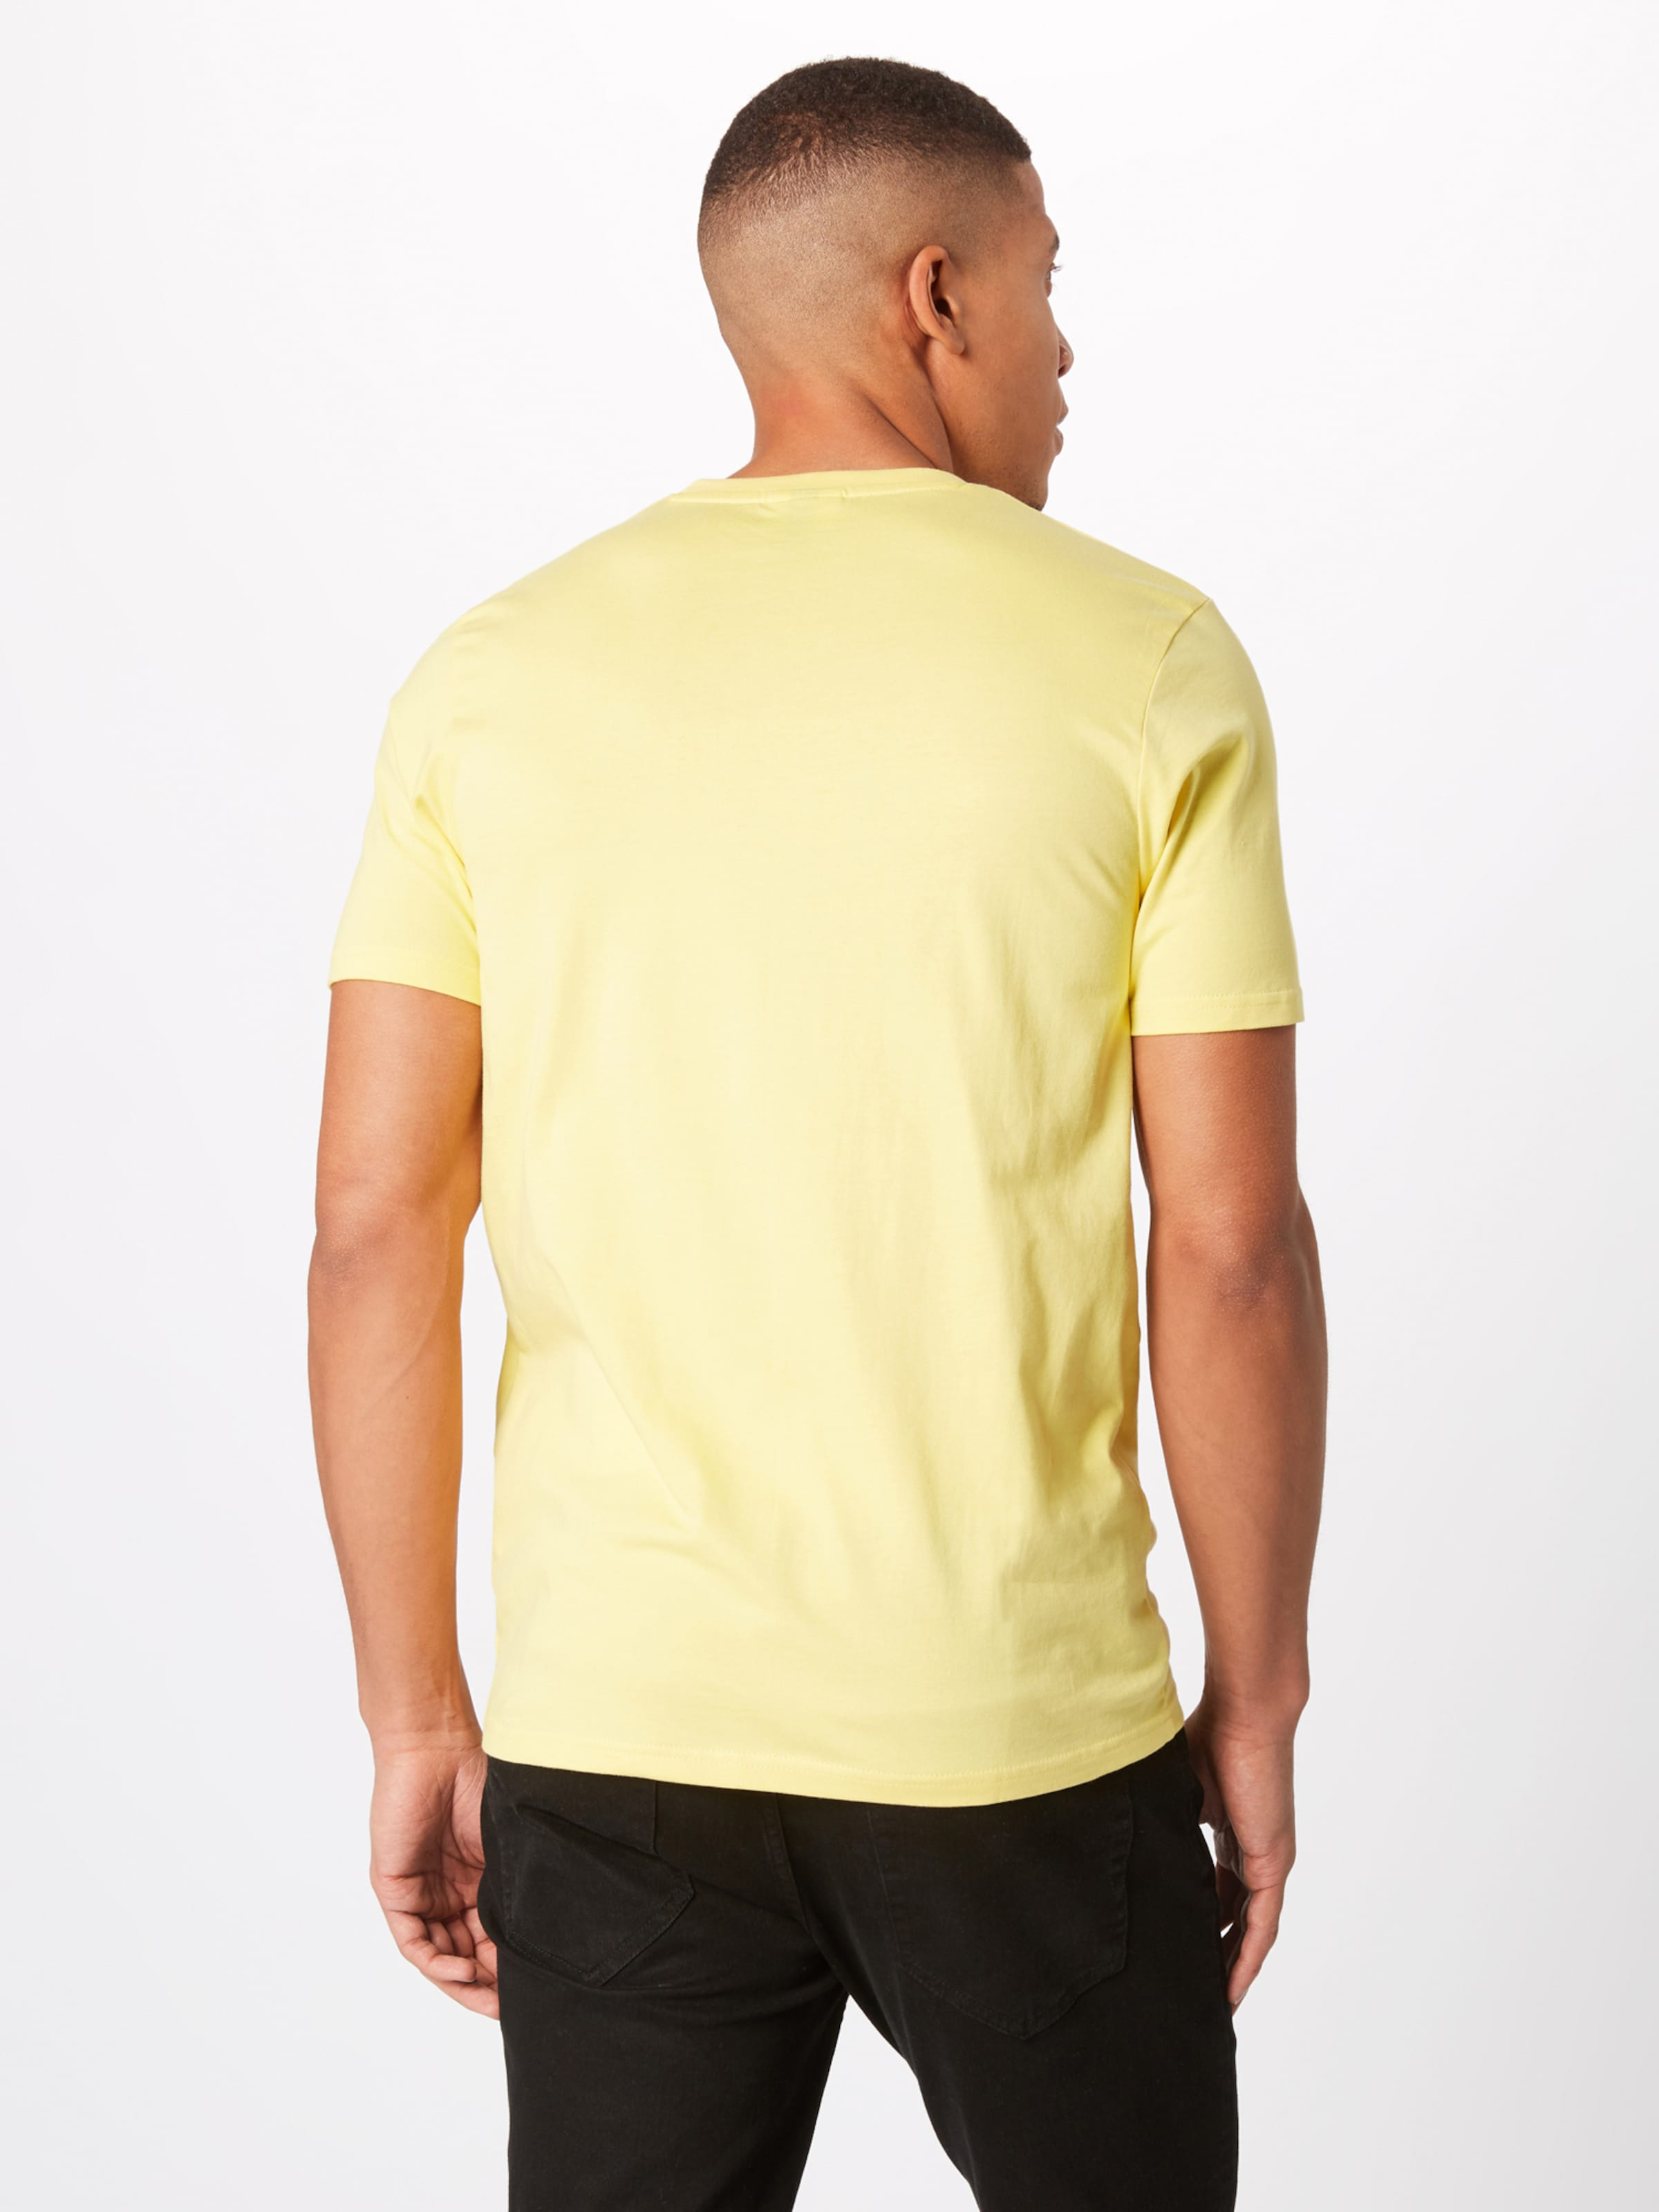 Bleu T shirt En FoncéGris Chiné Ellesse 'prado' SzVpqGLUM